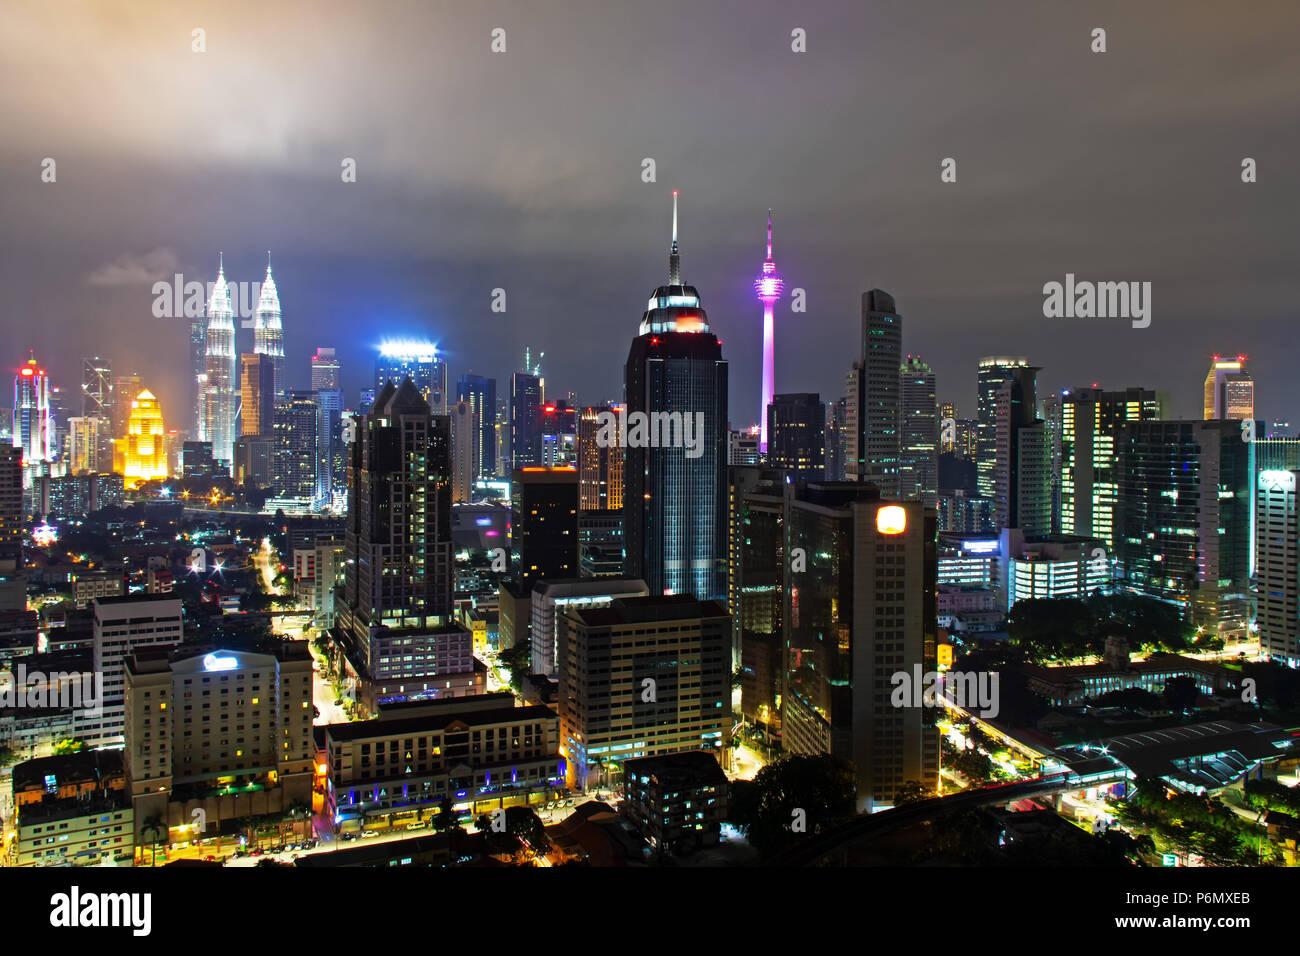 Night view of Kuala Lumpur skyline, capital city of Malaysia. - Stock Image